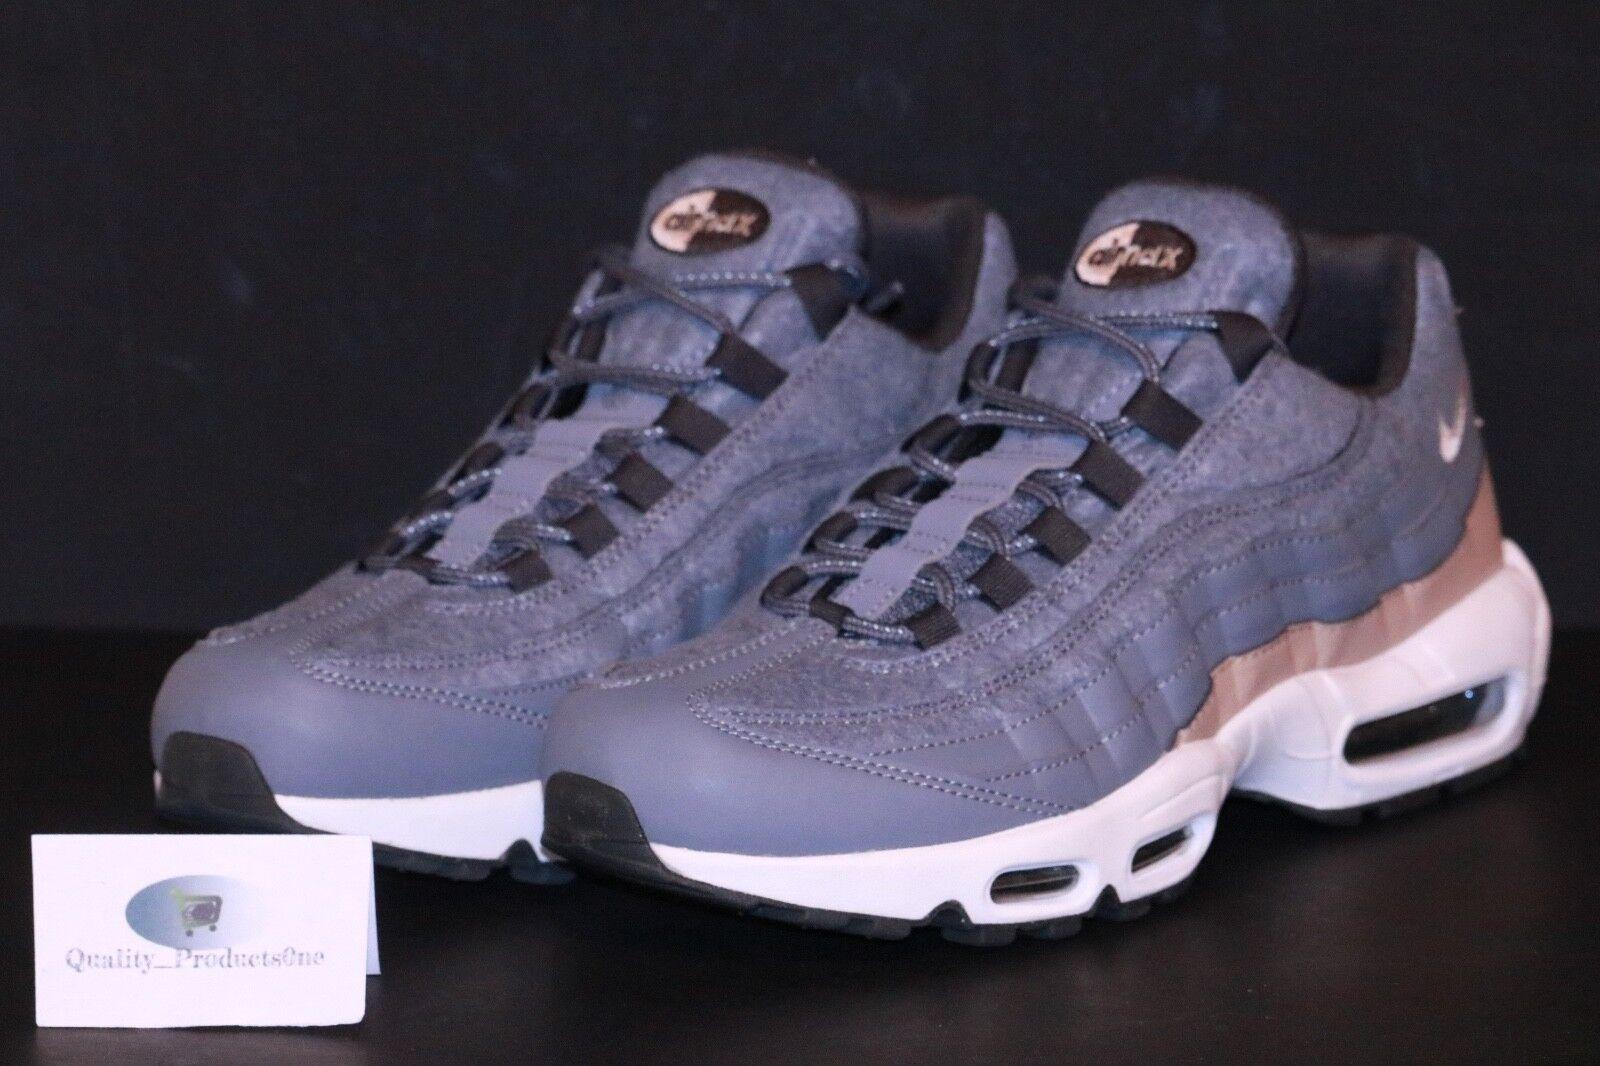 76dba7917a84 Nike Men s Air Max 95 Premium Cool Grey mushroom Deep Pewter Running ...